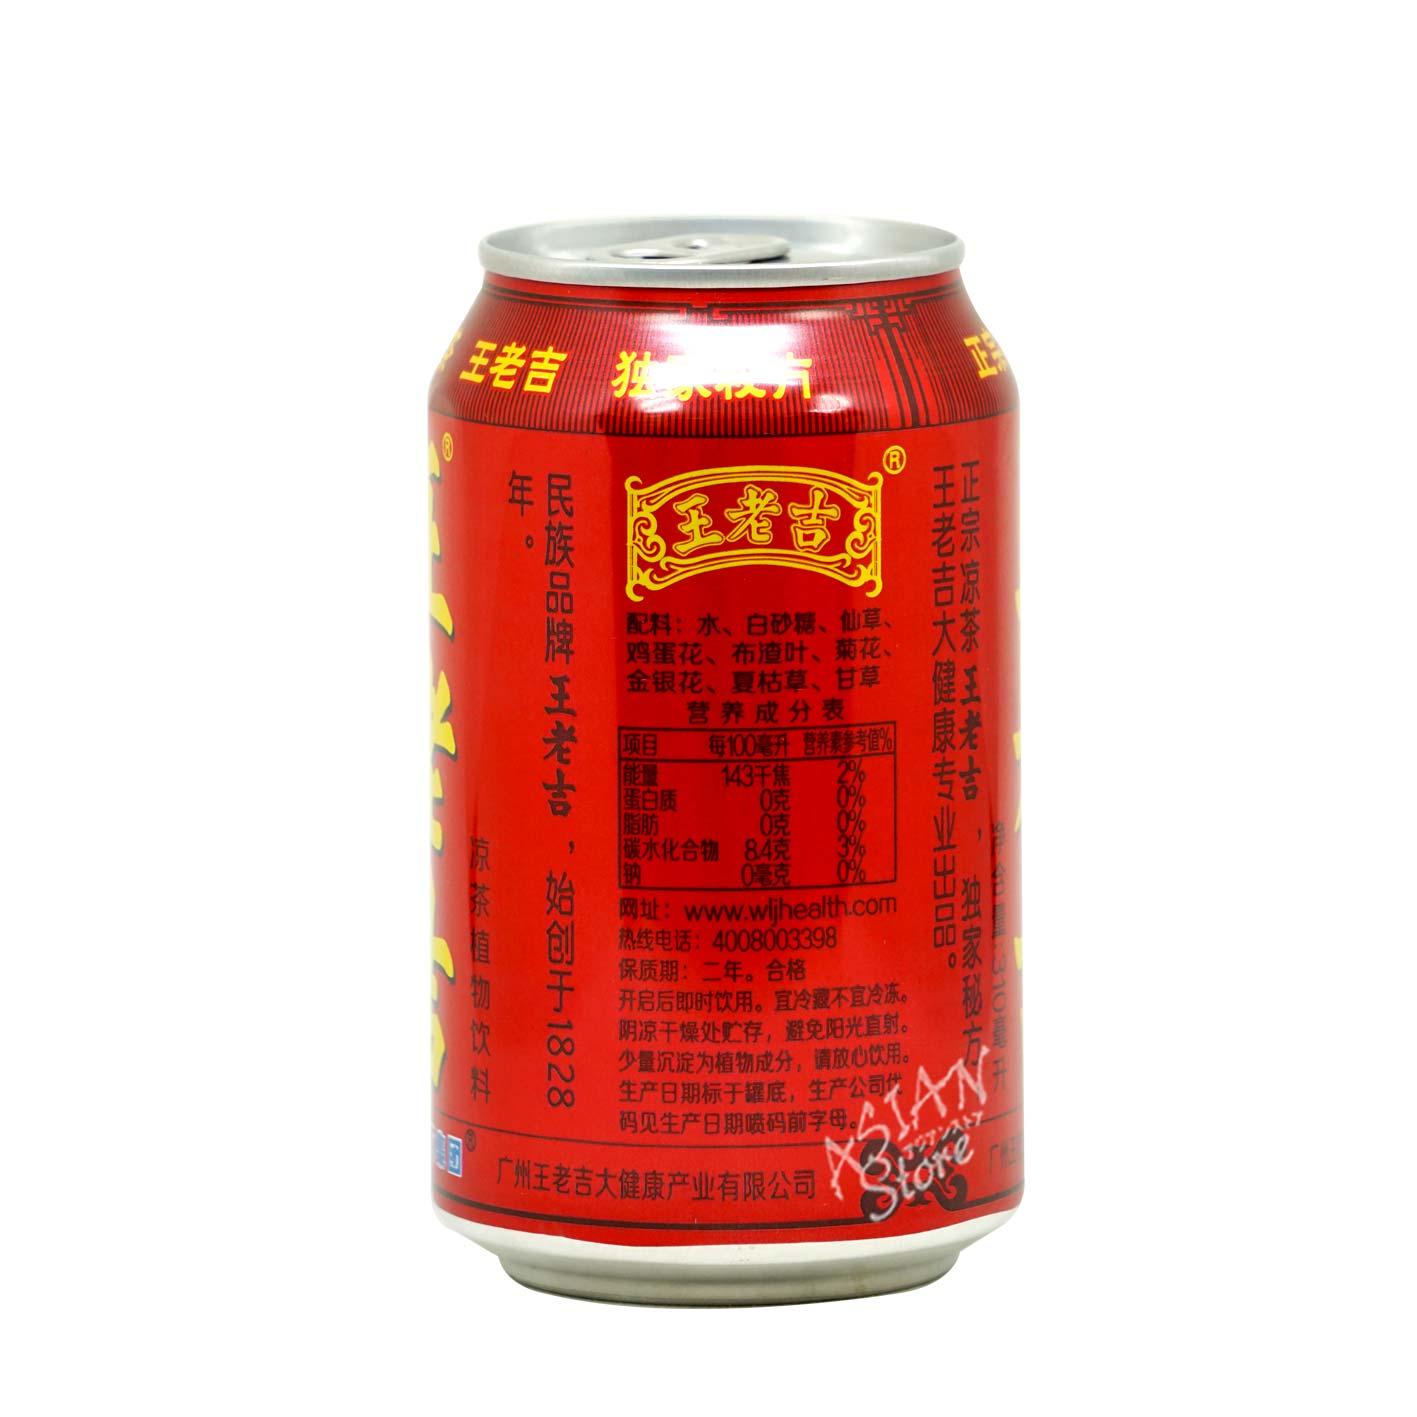 【常温便】(缶)中国大人気健康茶 ワンラオジー/涼茶 王老吉310ml